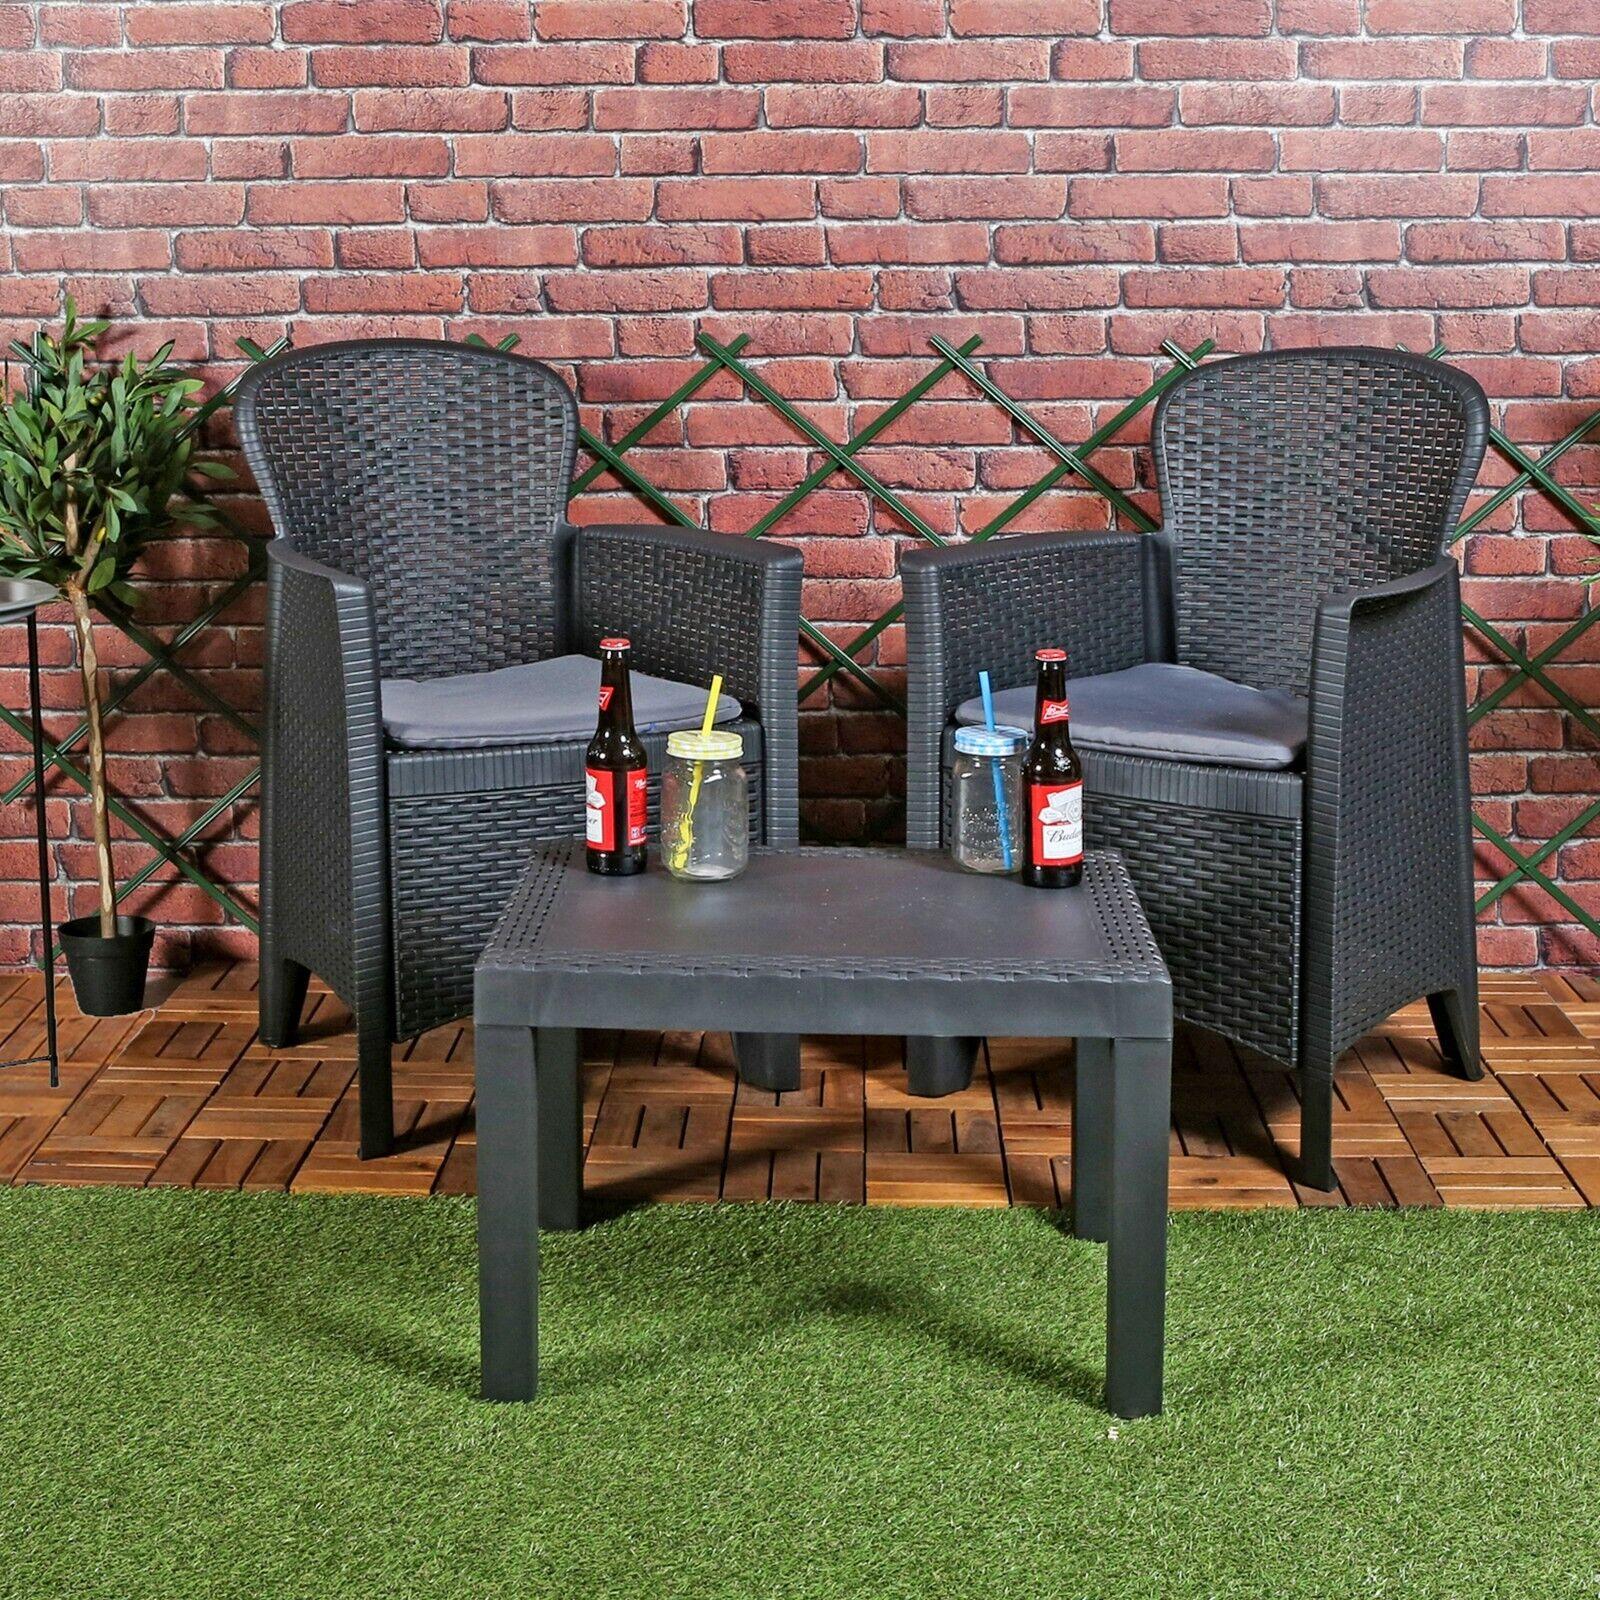 Garden Furniture - 3pc Outdoor Garden Furniture Cushioned Black Rattan Table Chair Conversation Set